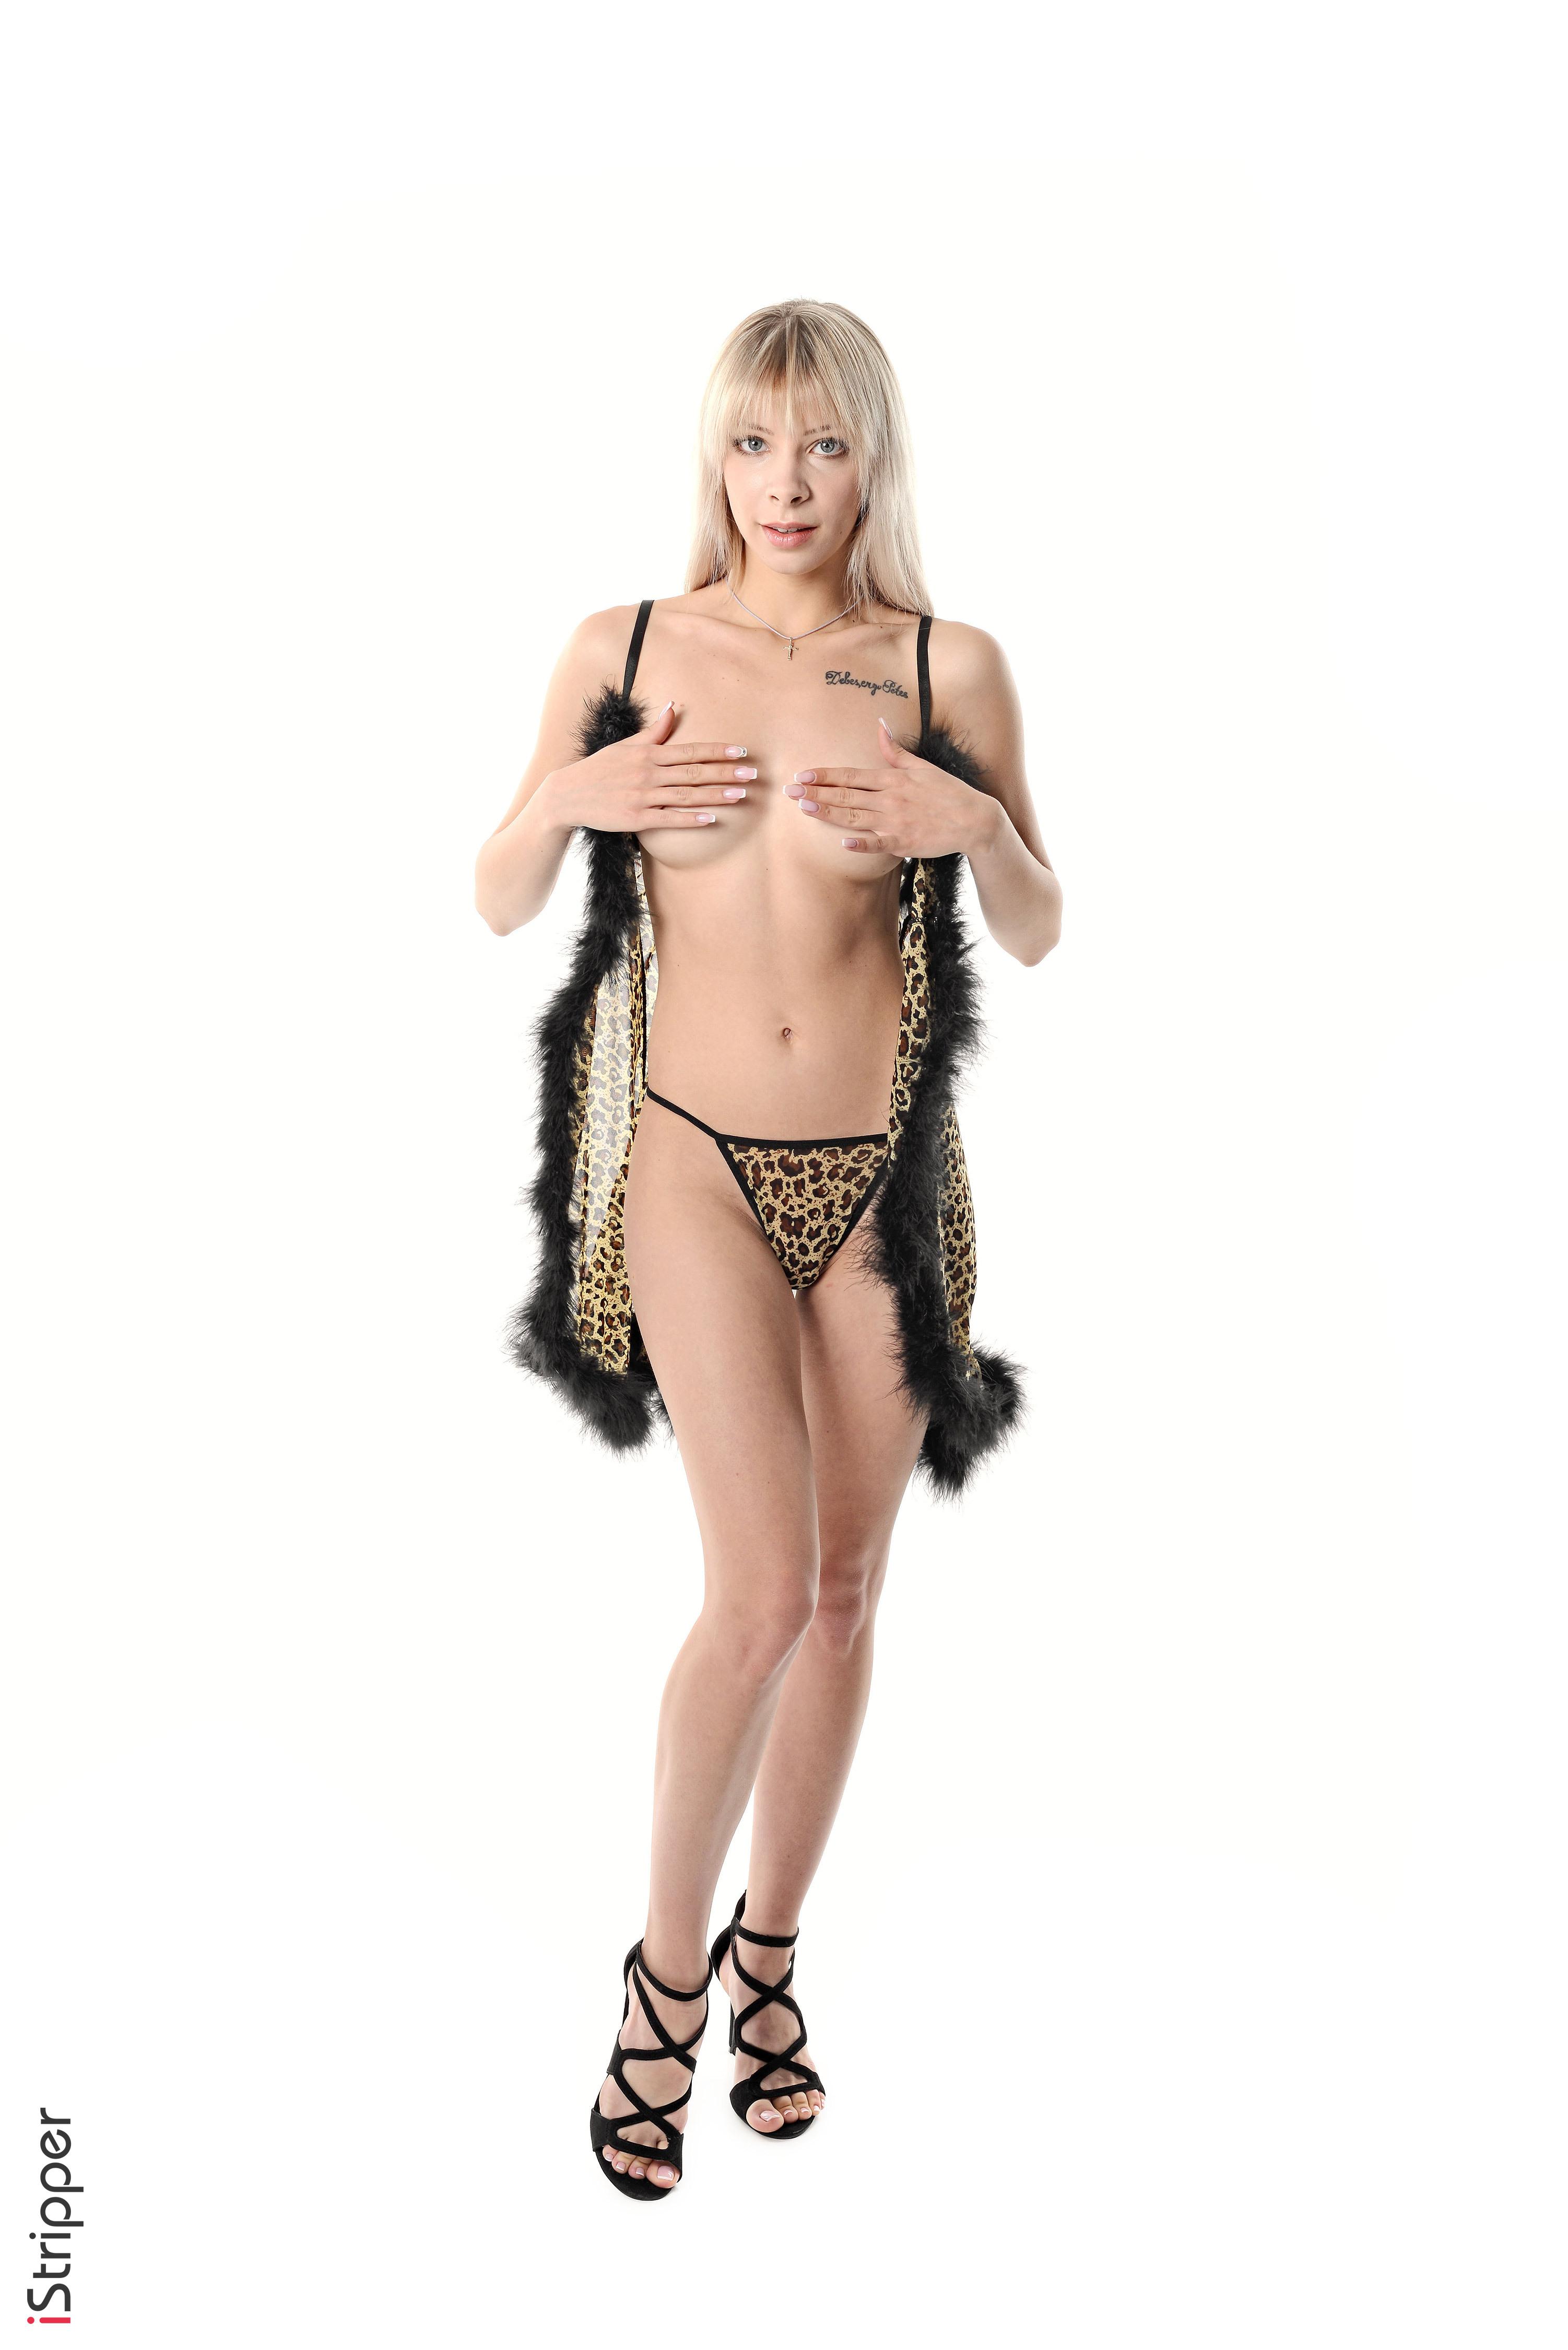 desktop stripper axelle parker hot blond in sexy nude photo